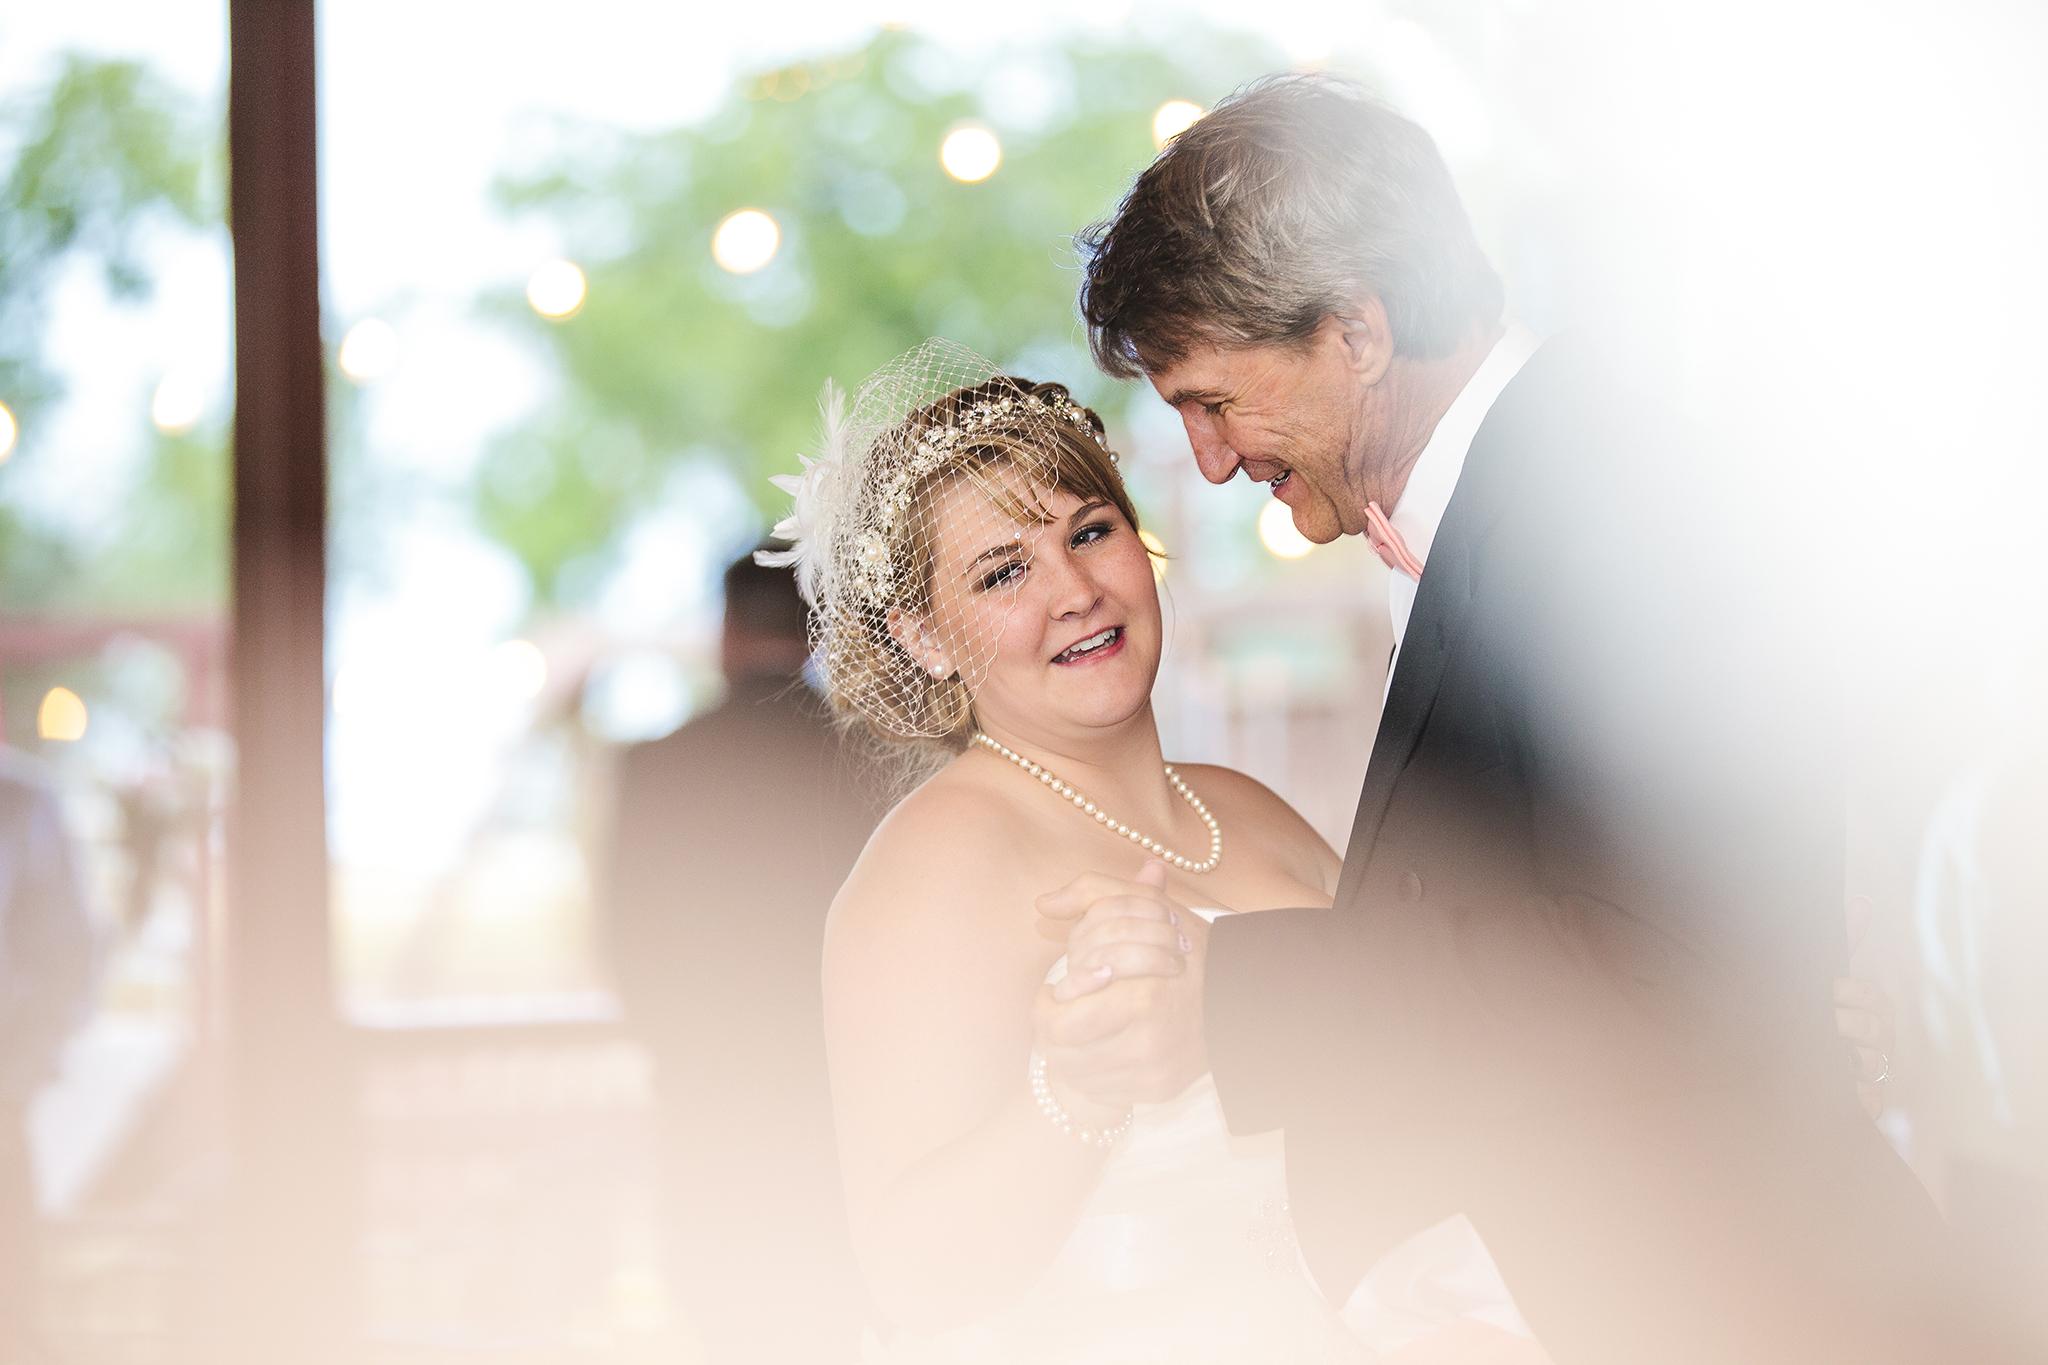 Father Daughter Dance, Walnut Tree Weddings, Shoot through flowers, Walnut Tree Weddings